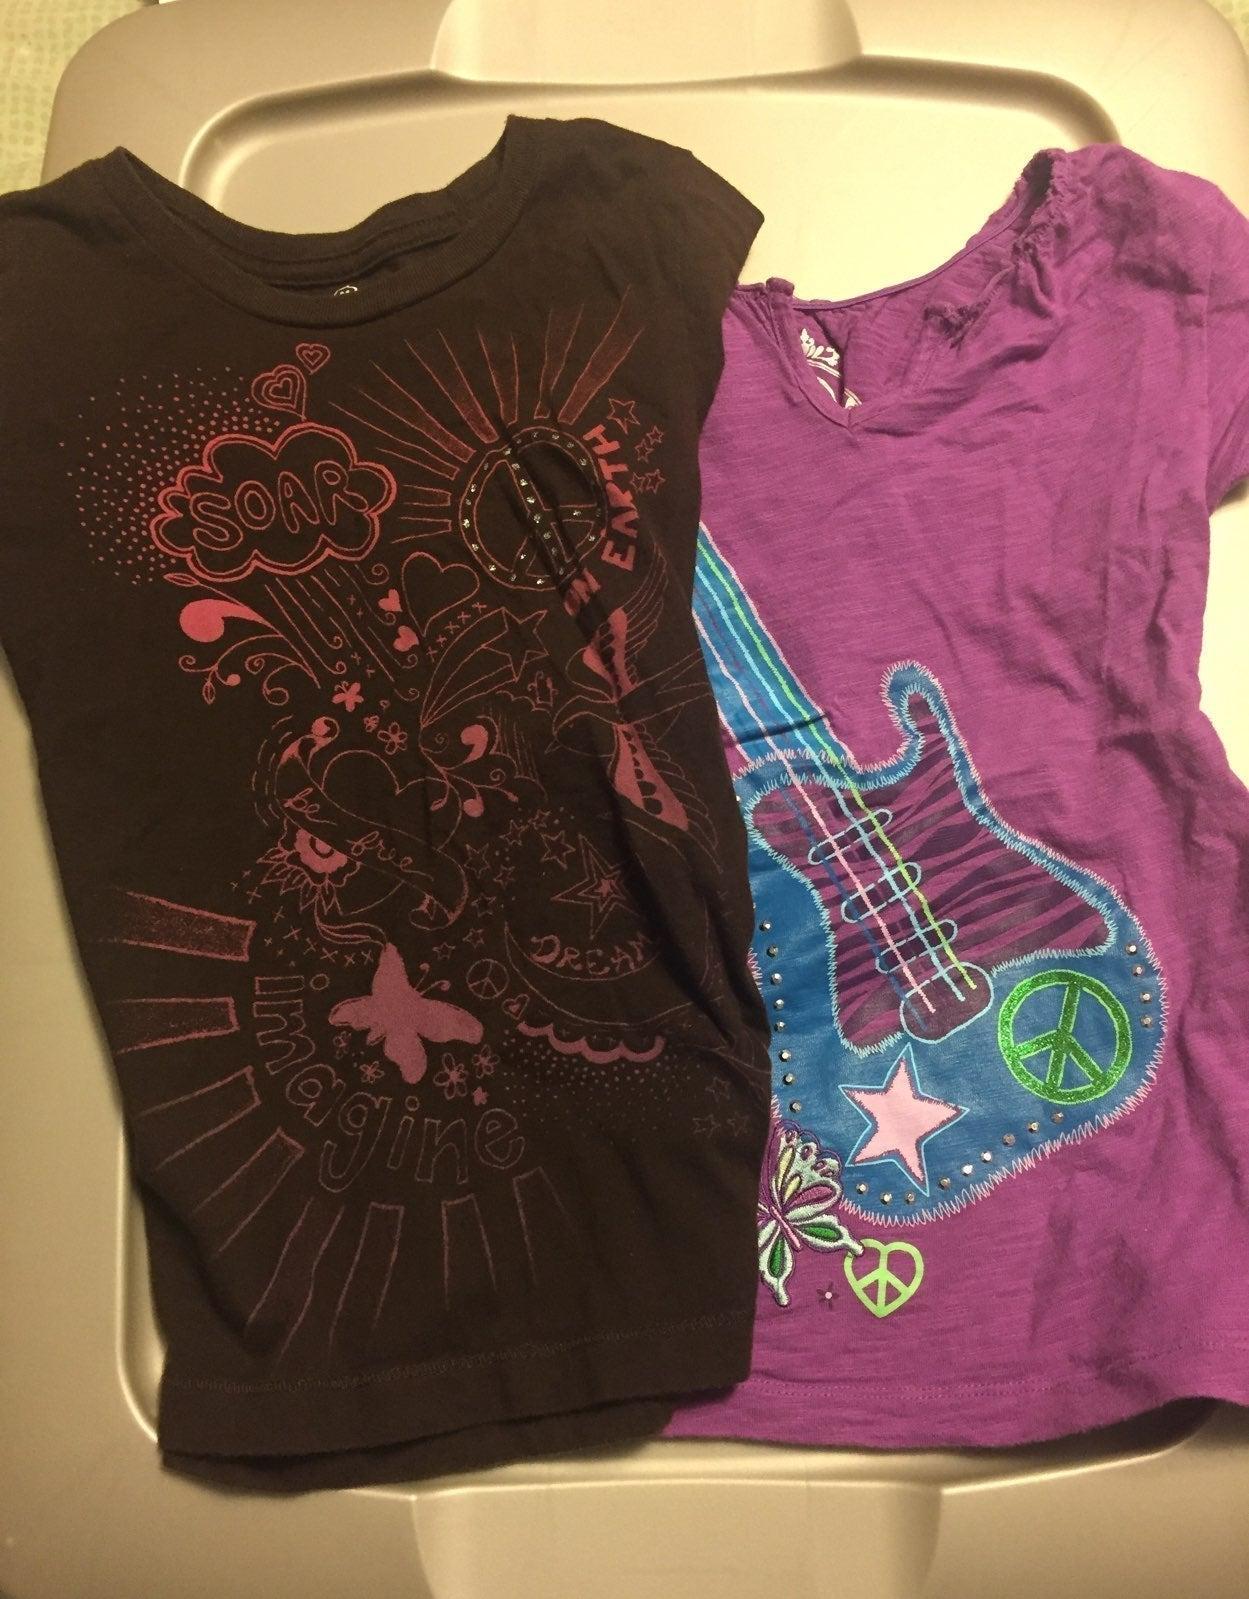 Girls size small tshirts